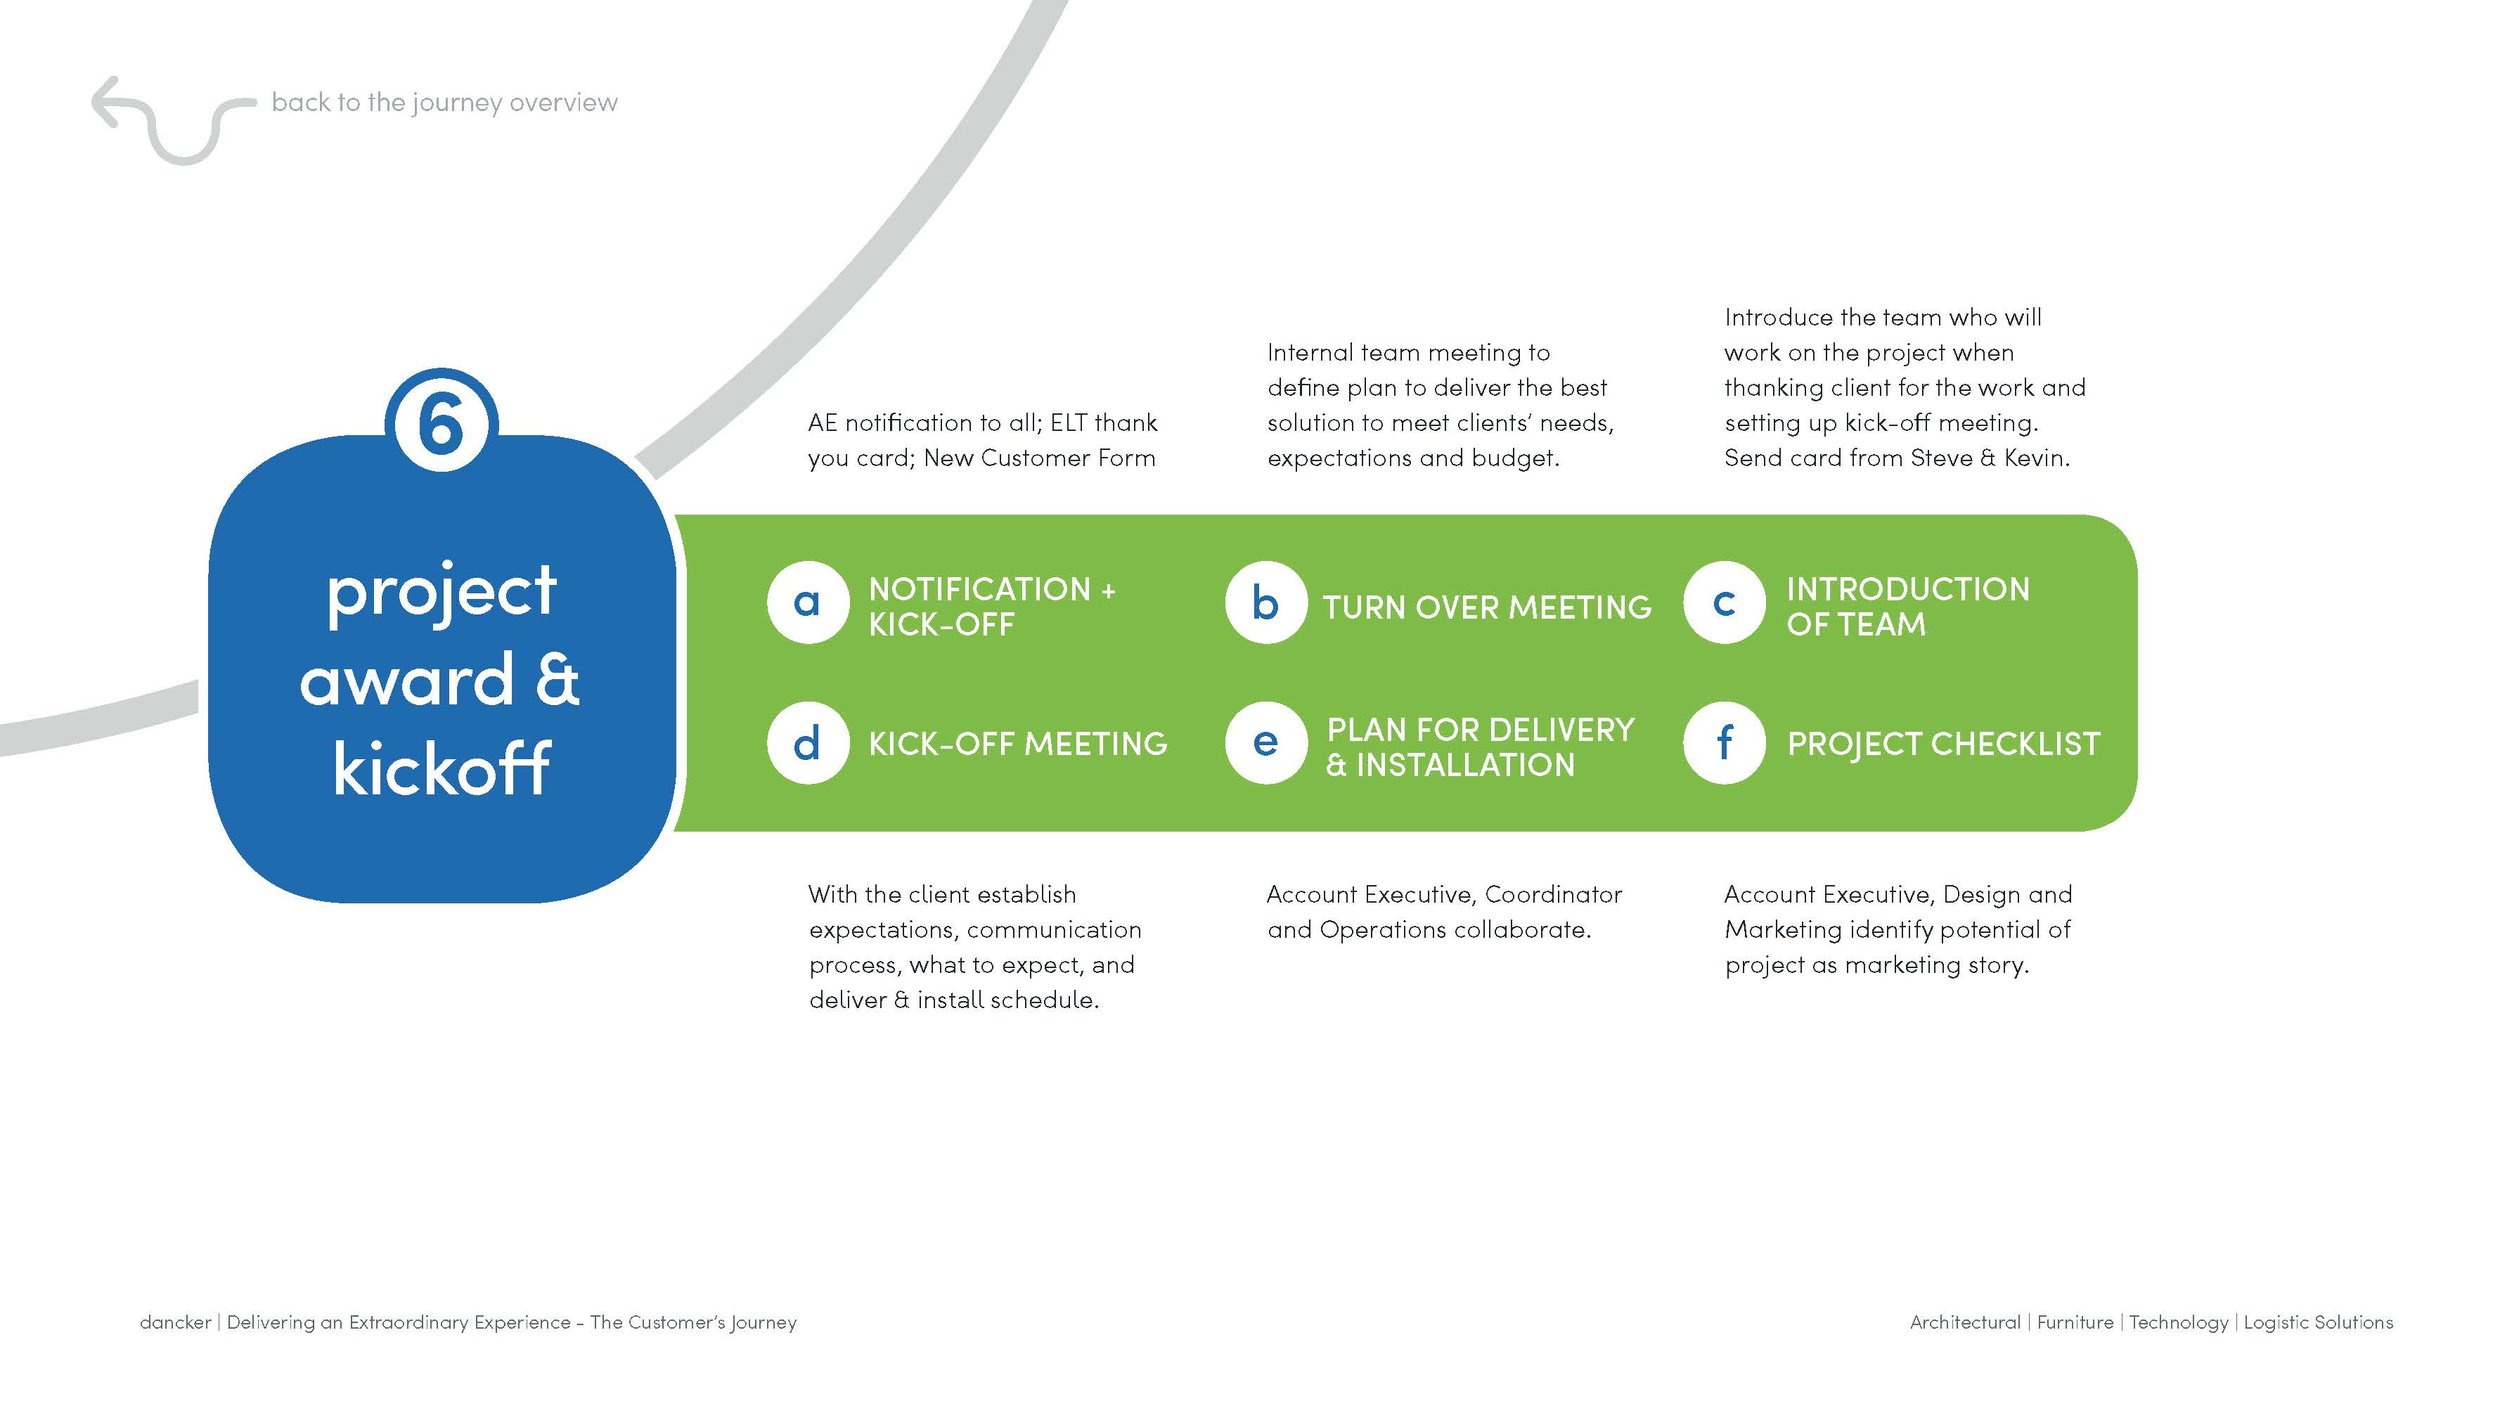 dancker_Customer Journey_Interactive Process_draft 3_Page_28.jpg